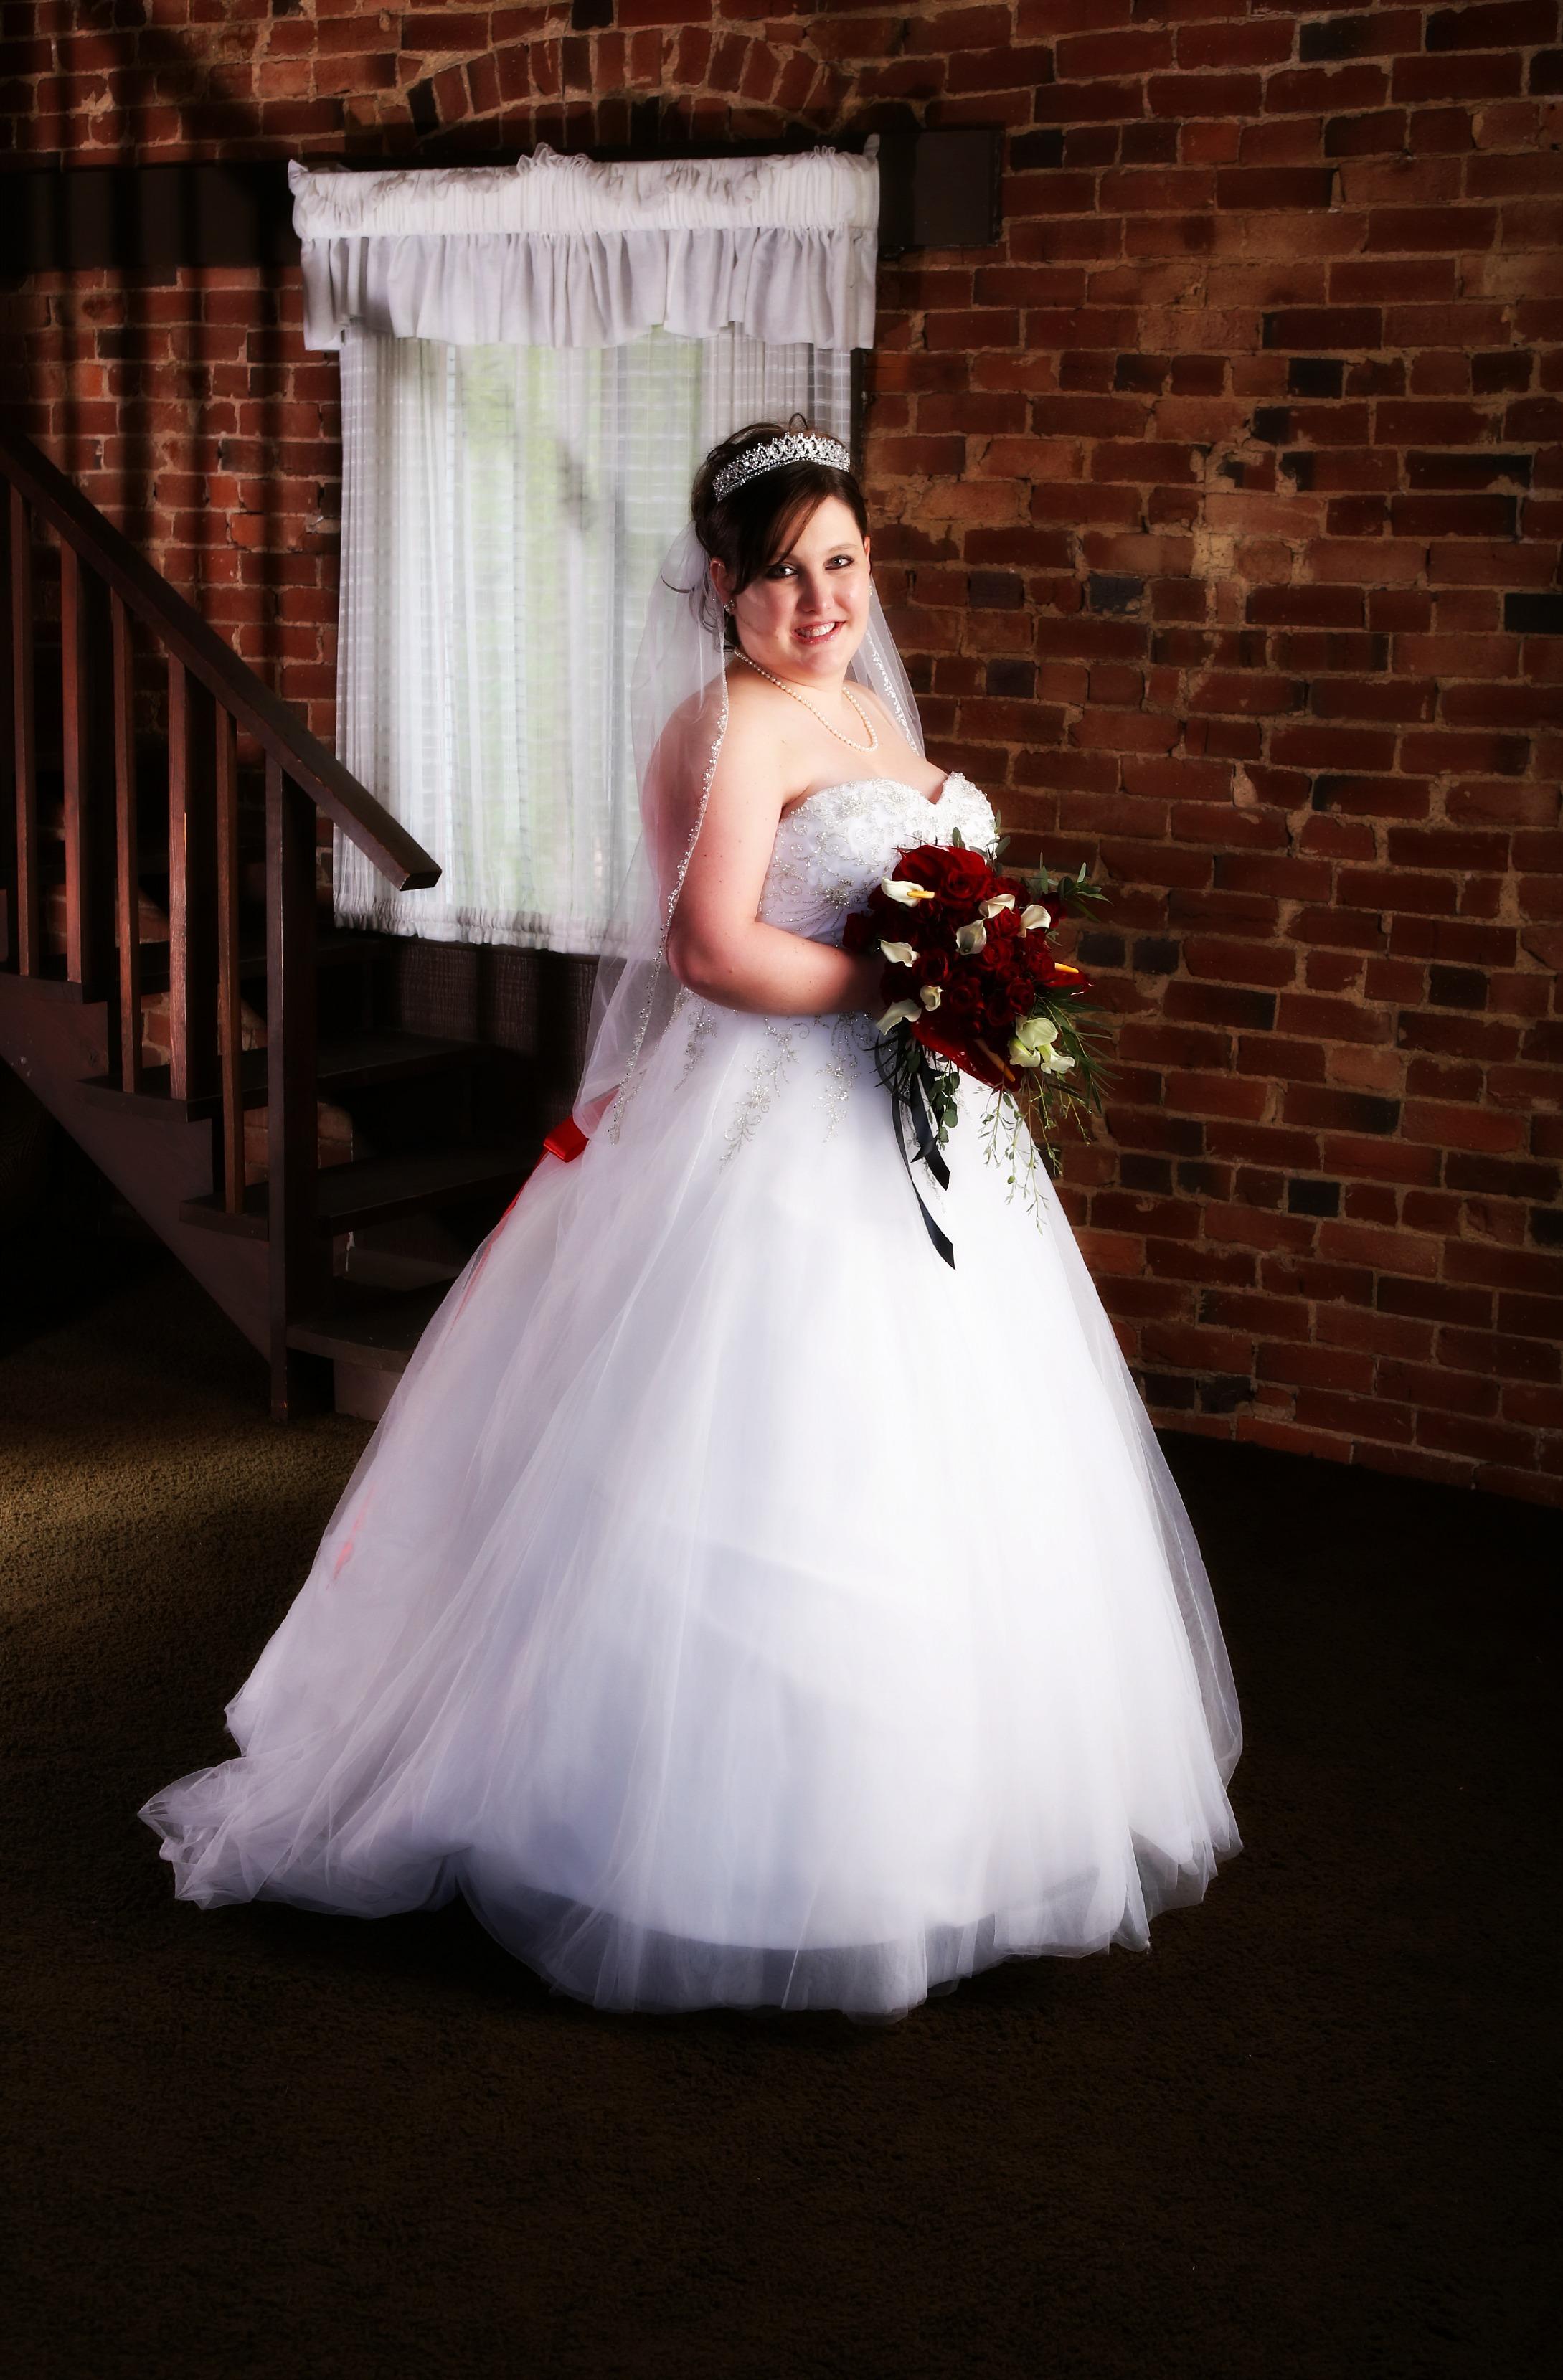 Bountiful wedding photography studio, located in Davis County Utah